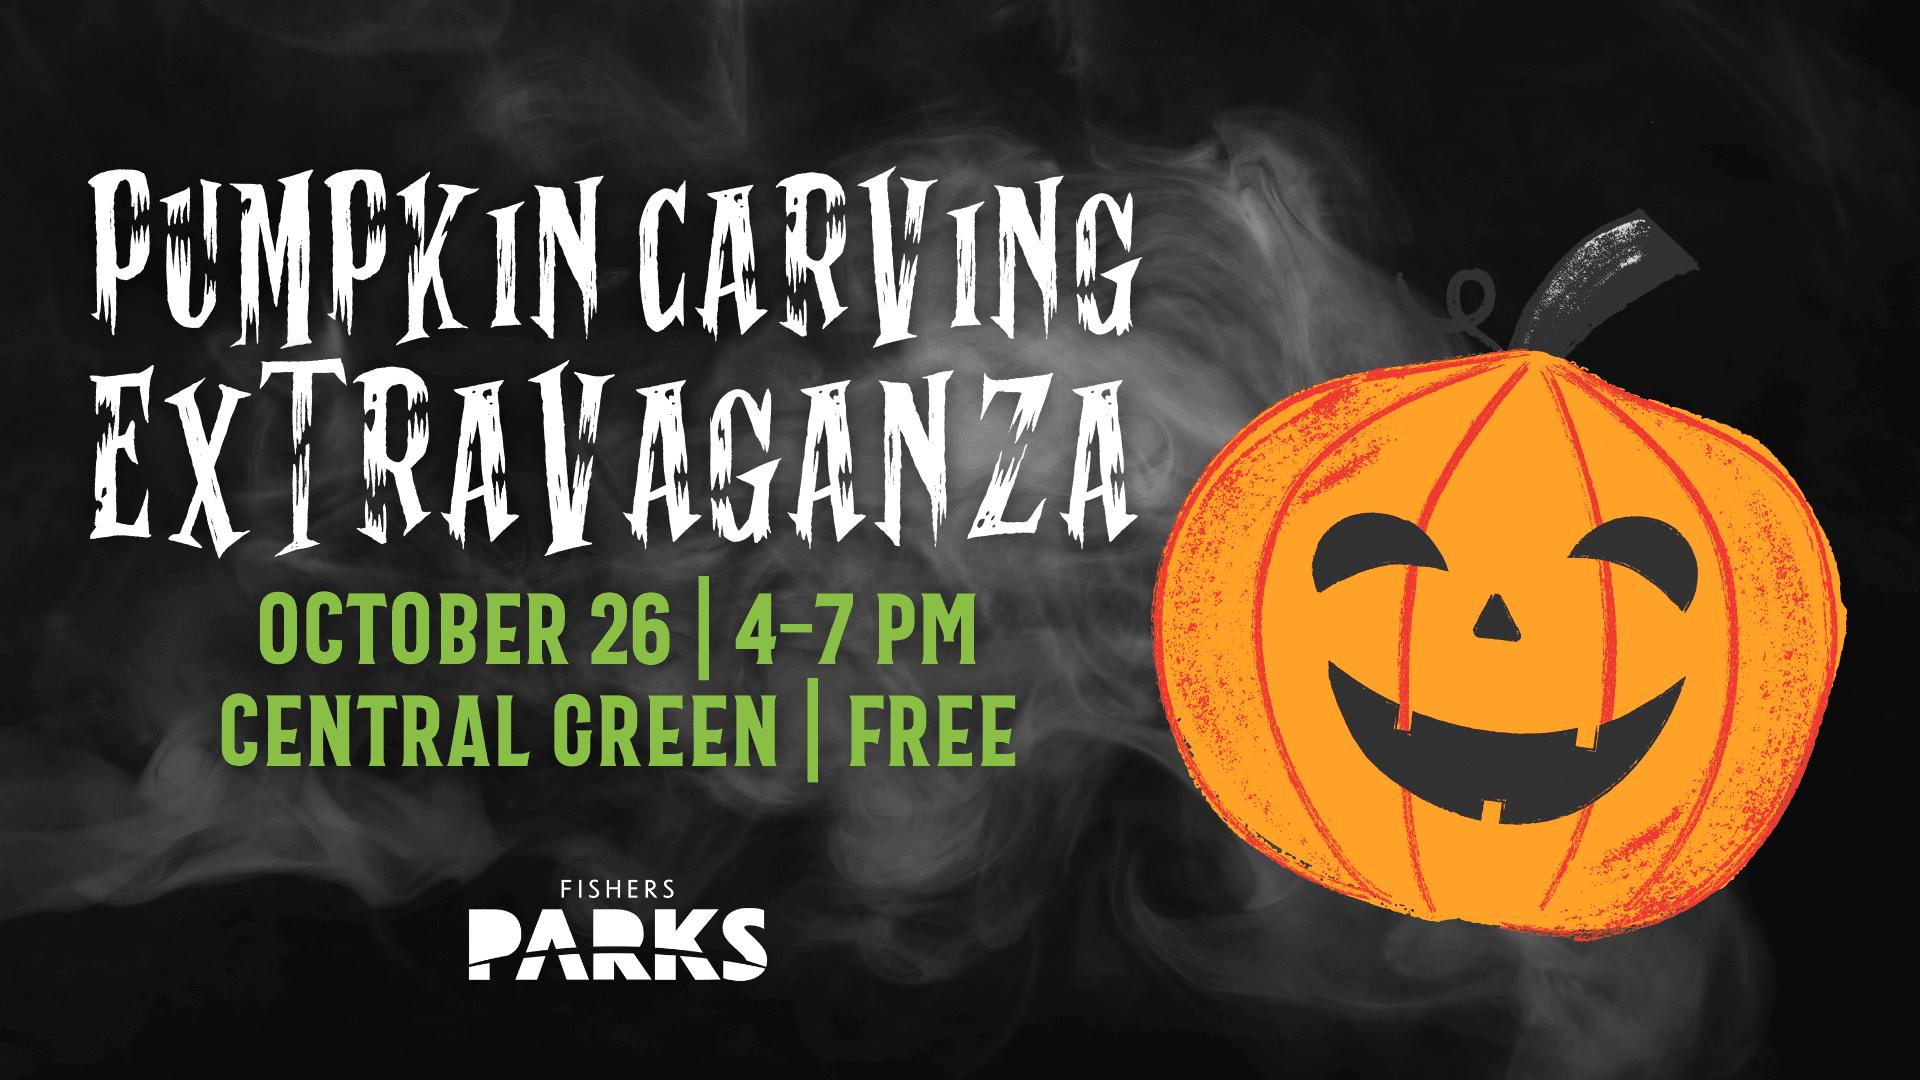 pumpkin carving extravaganza. october 26, 4 - 7 pm, central green, free